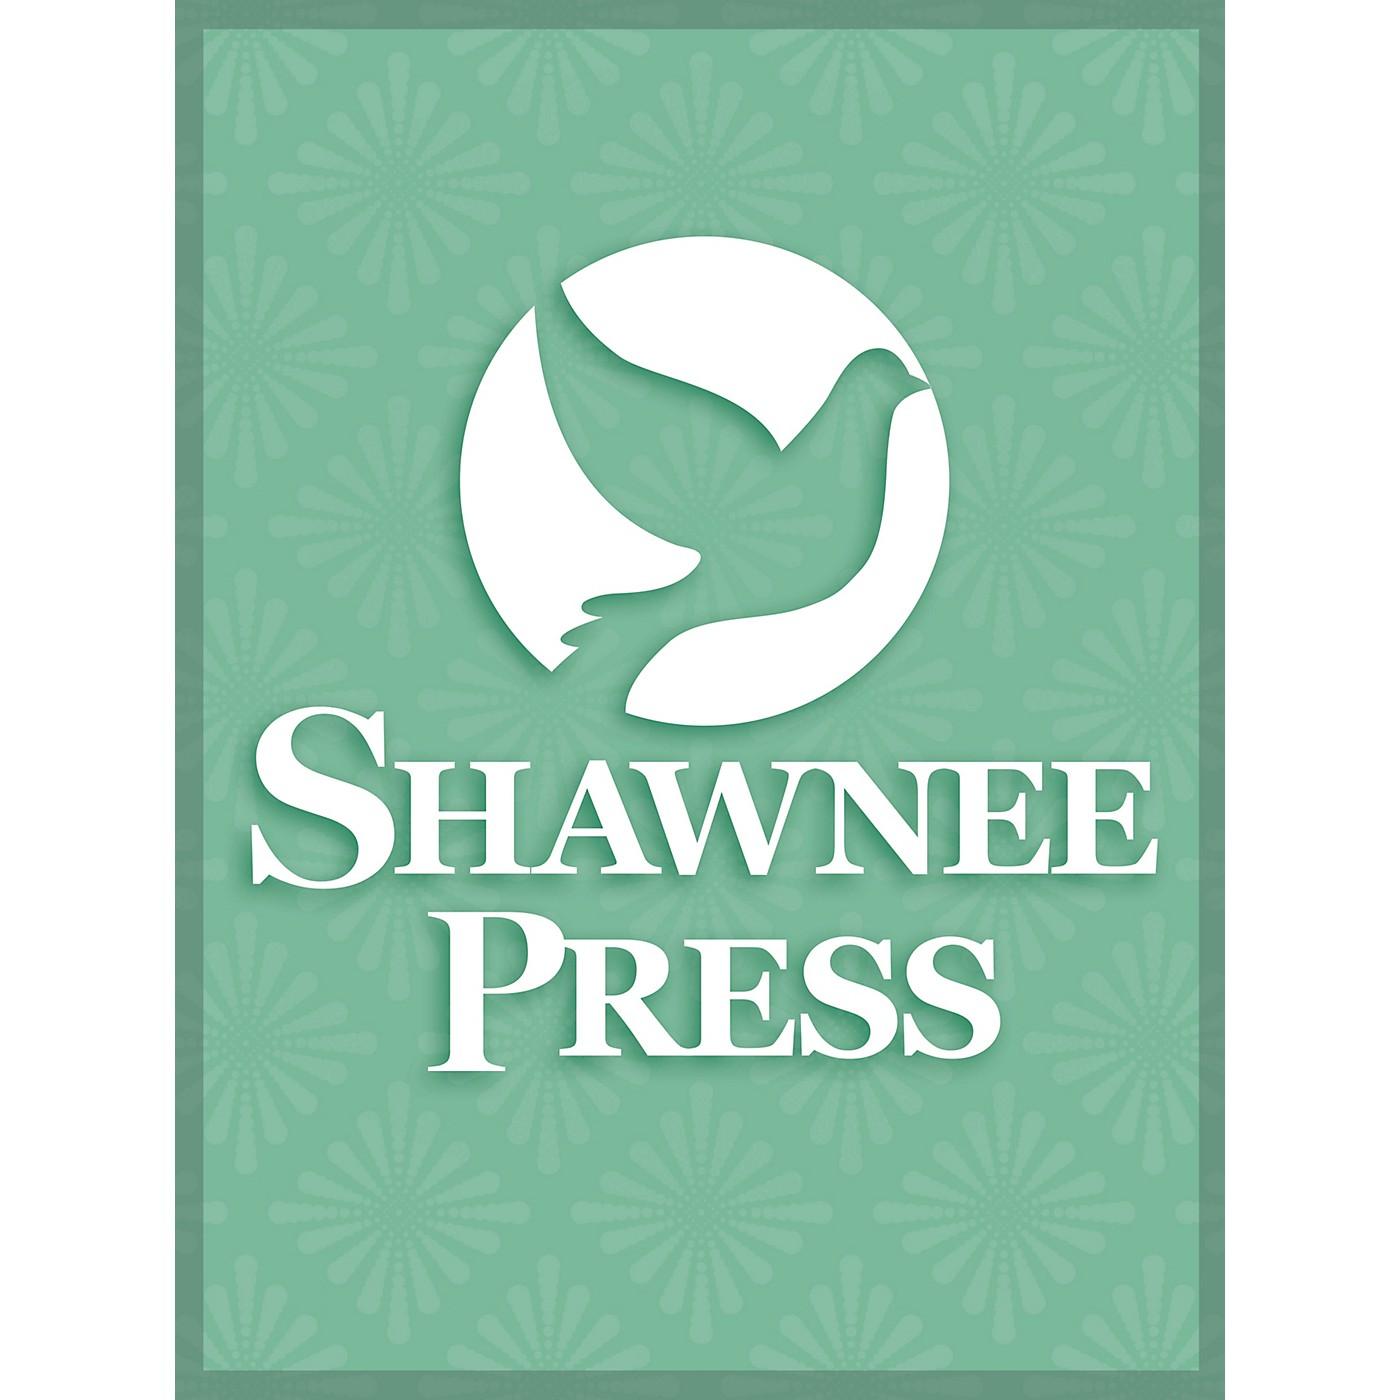 Shawnee Press Trilogy on Pentecost (Organ Collection, Sacred) Shawnee Press Series thumbnail